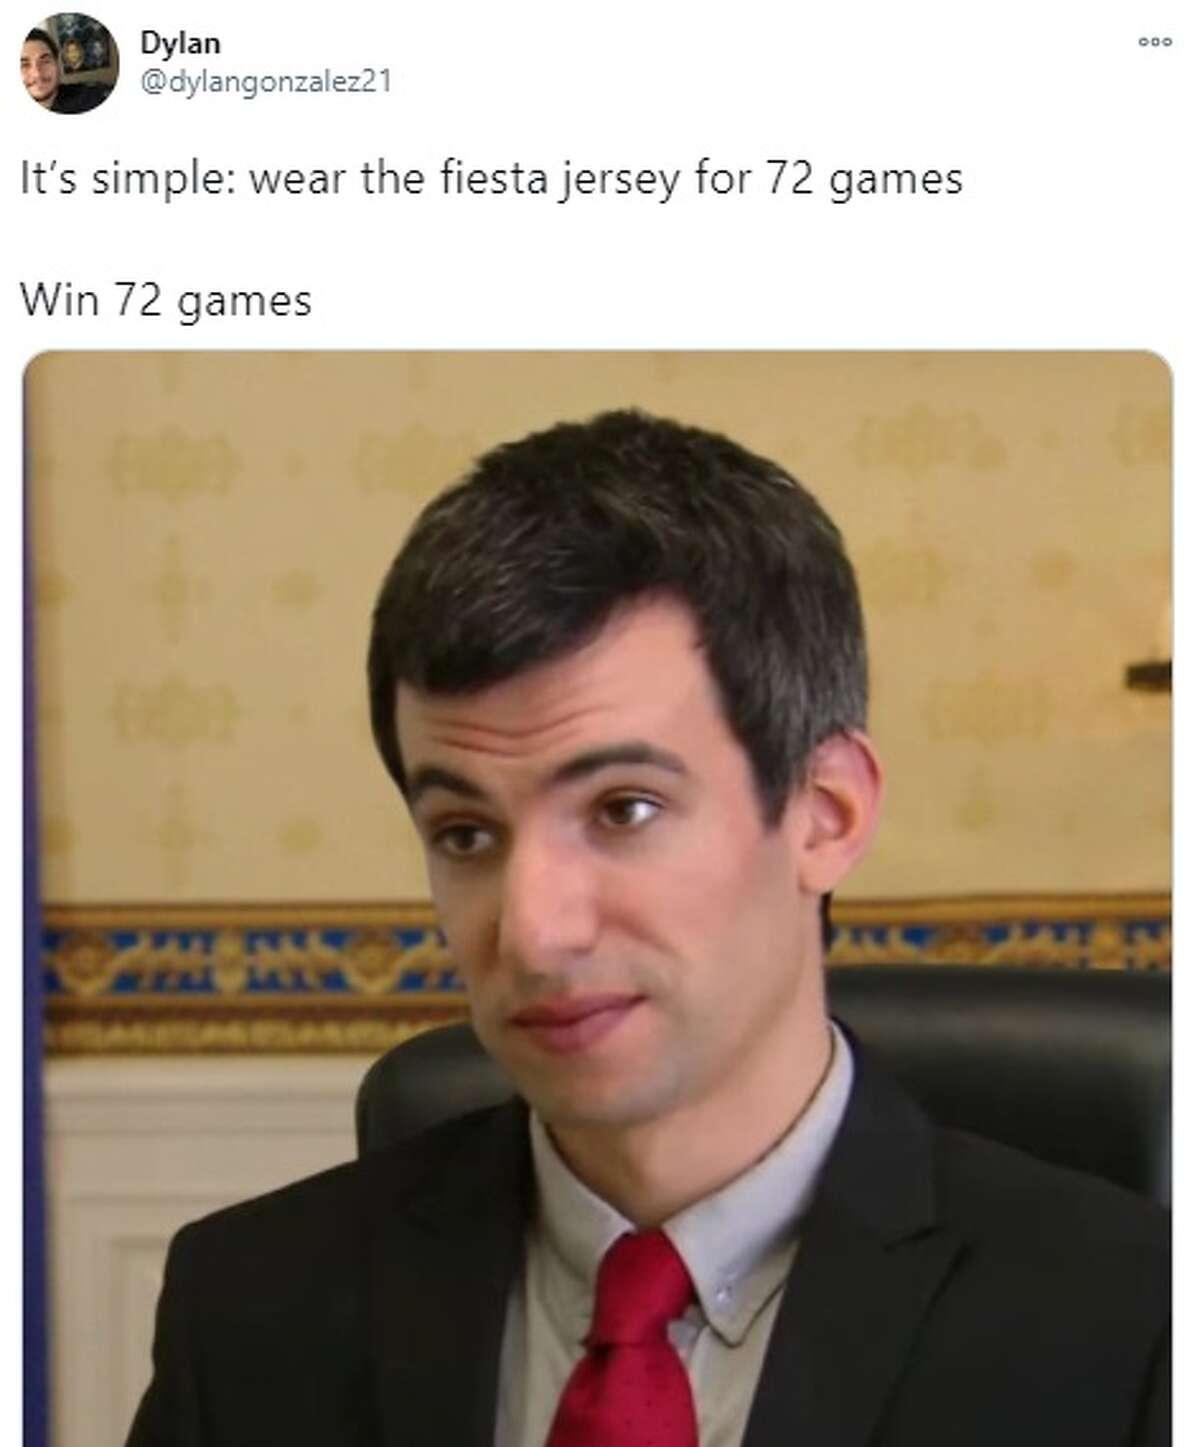 @dylangonzalez: It's simple: wear the fiesta jersey for 72 games Win 72 games